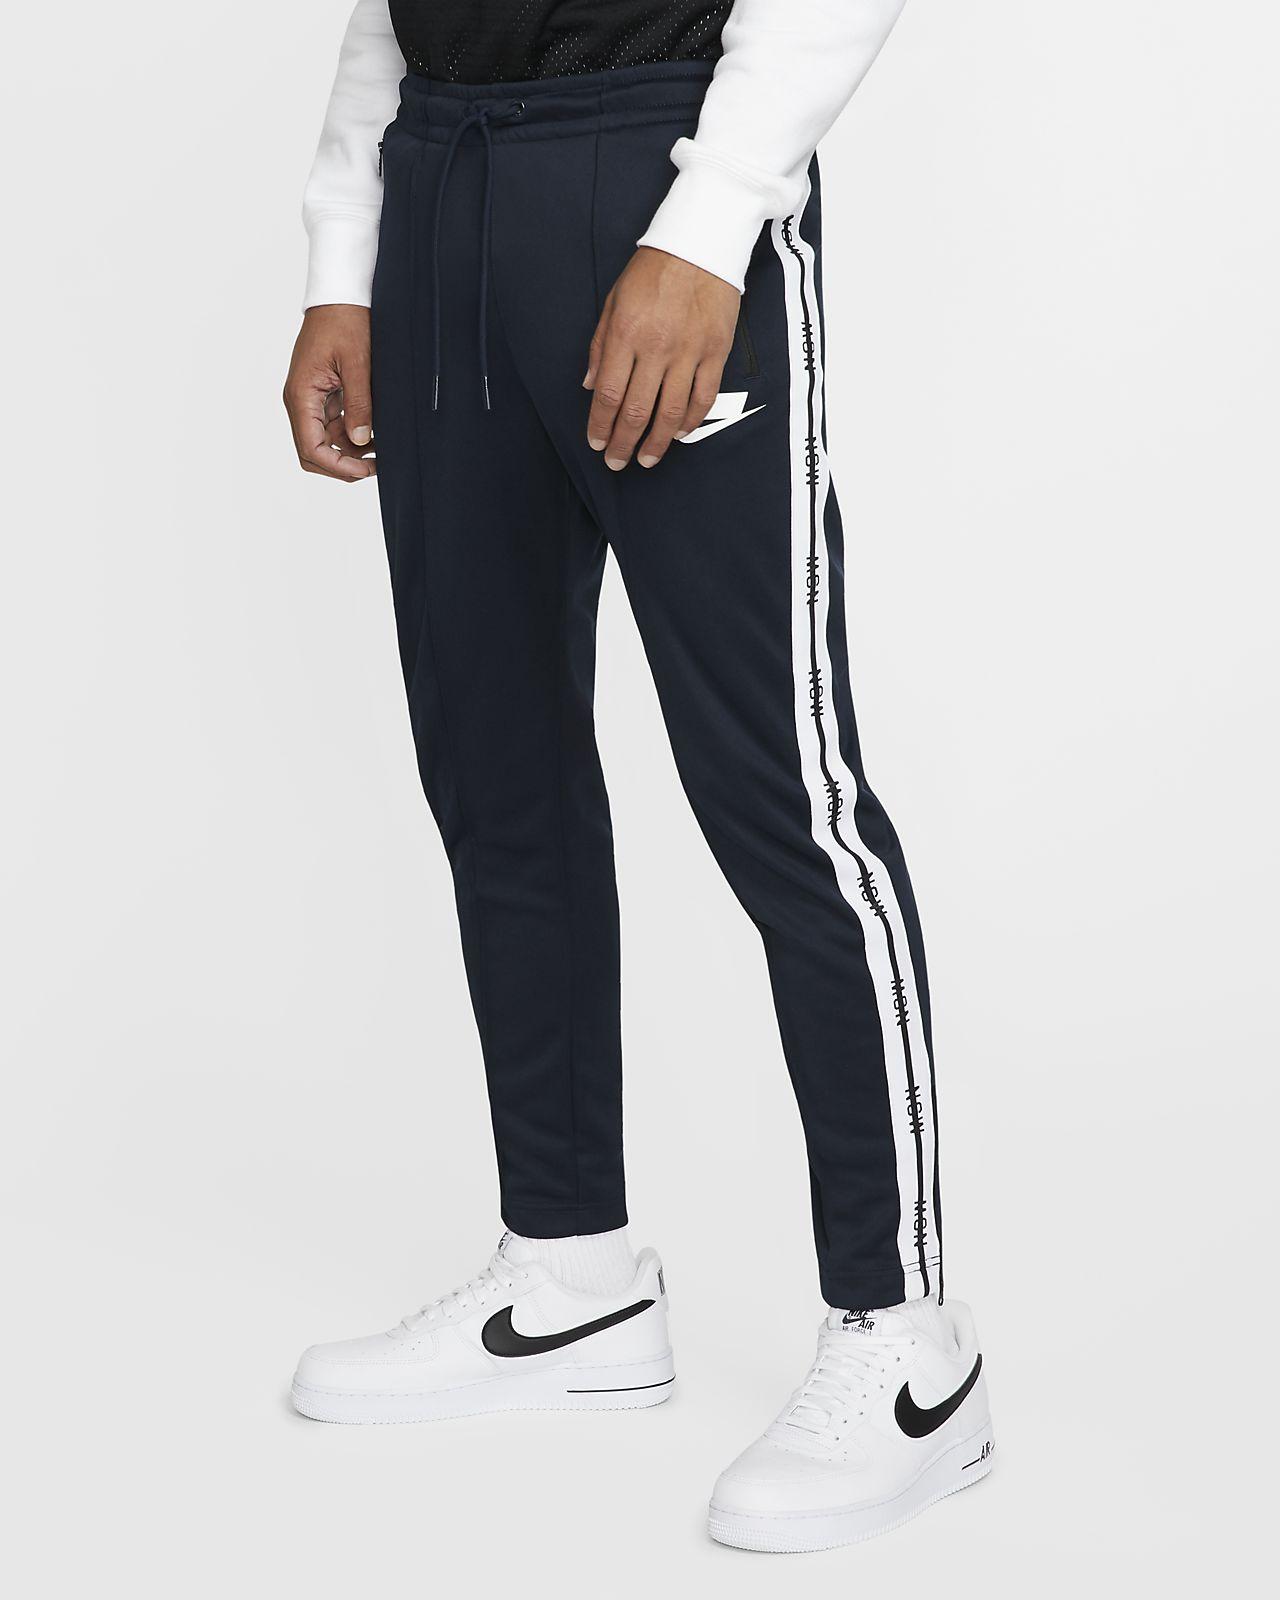 Nike Sportswear NSW Pantalón deportivo